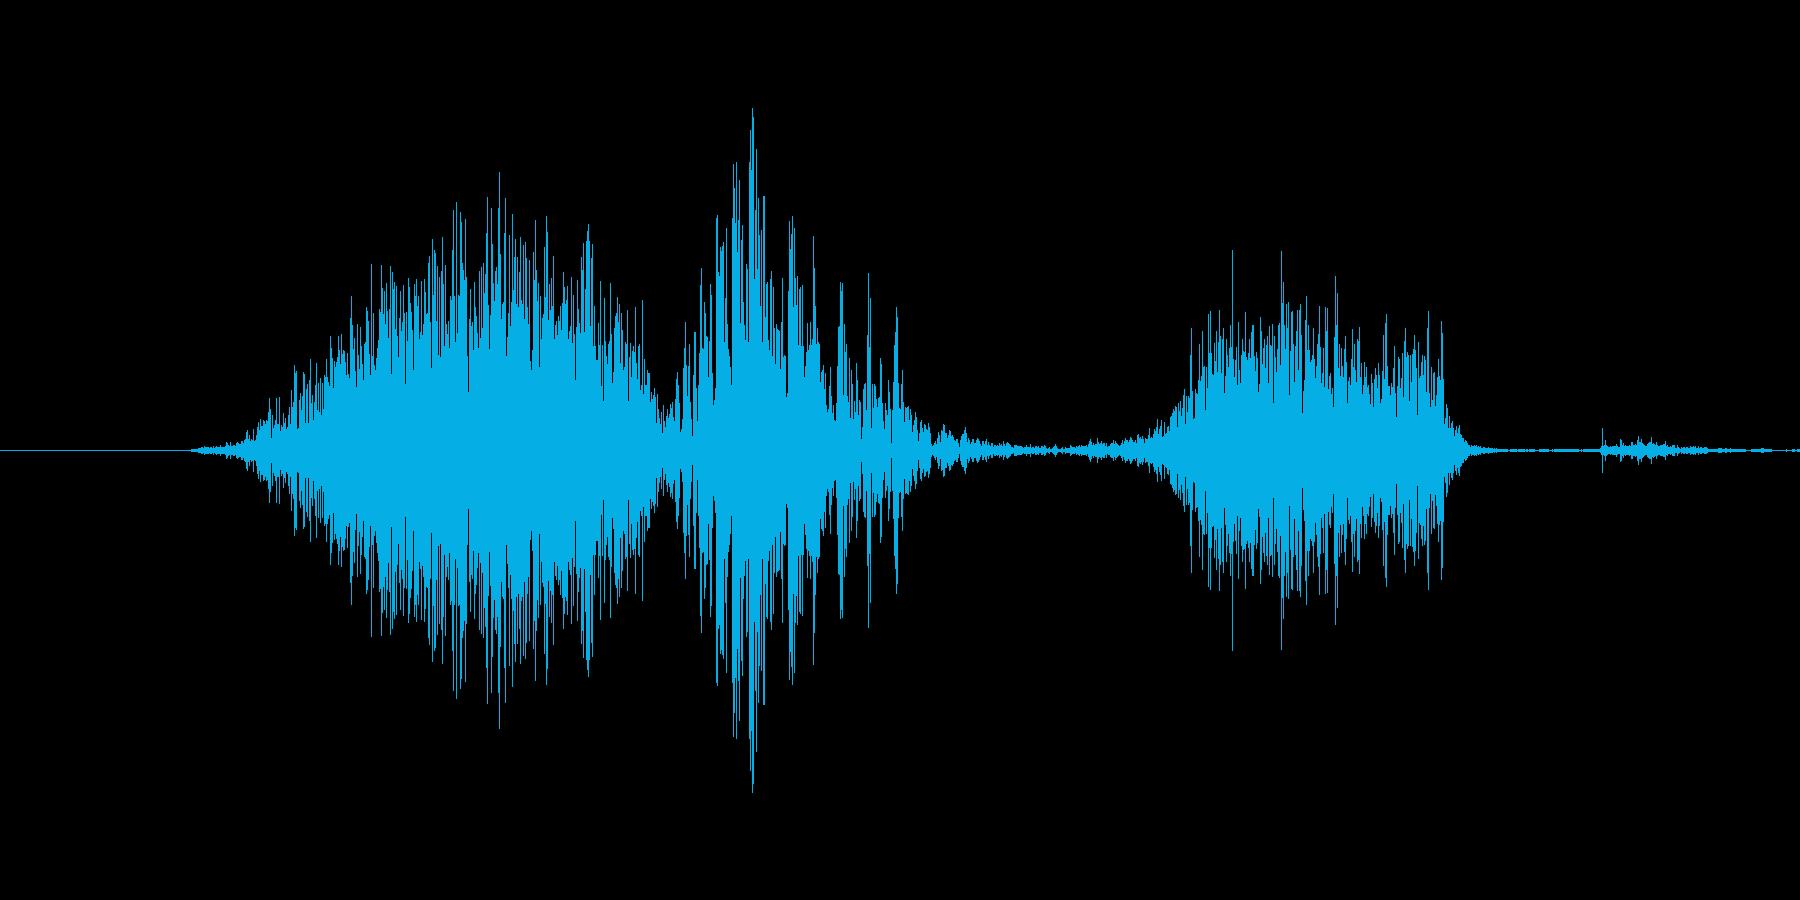 「6th/sixth」英語の再生済みの波形